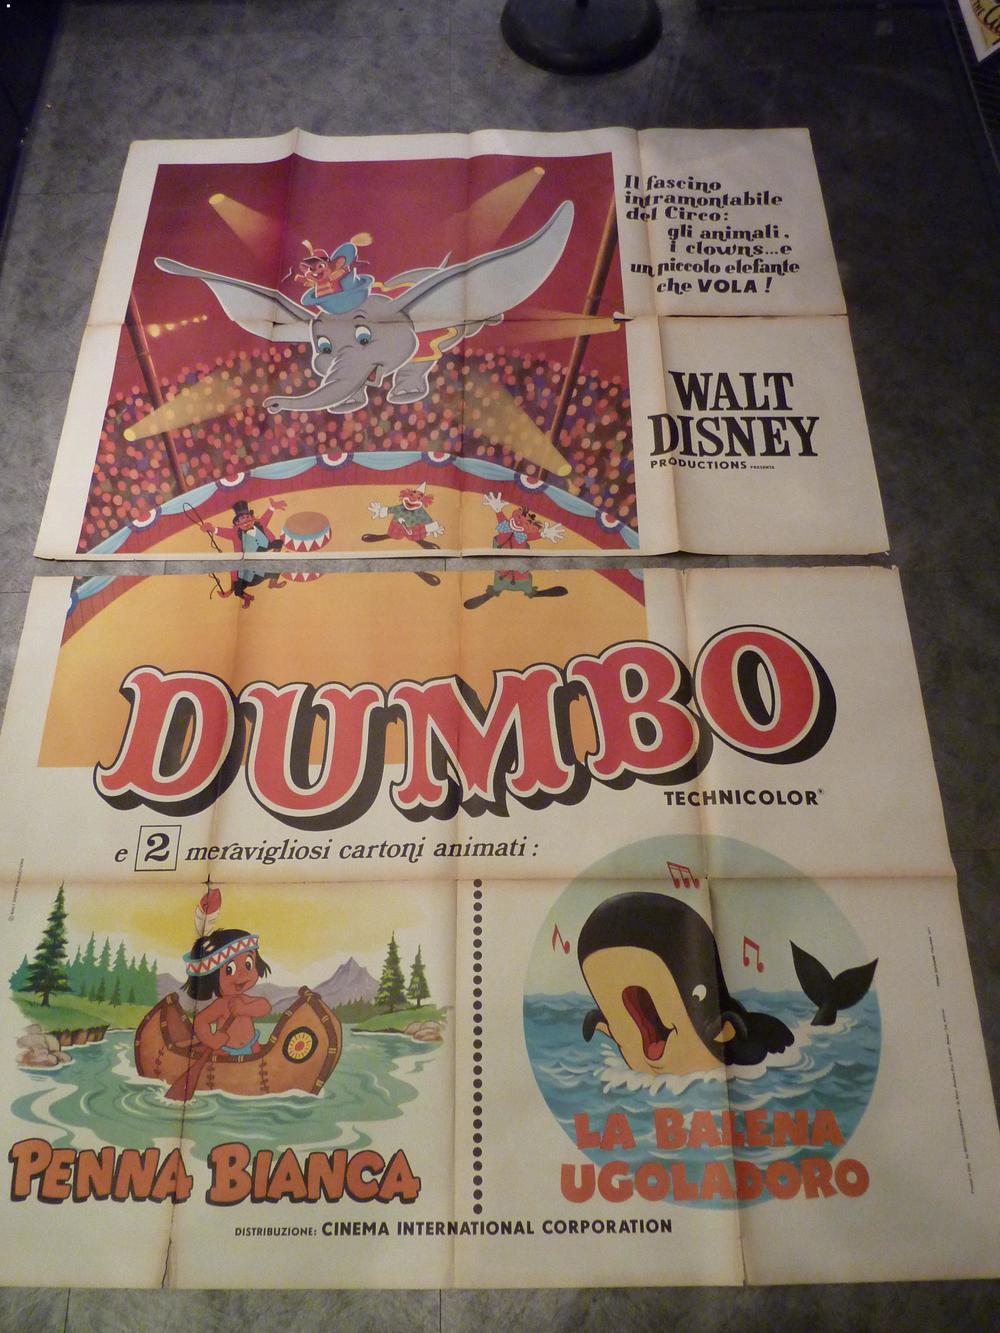 Dumbo Italian.jpg